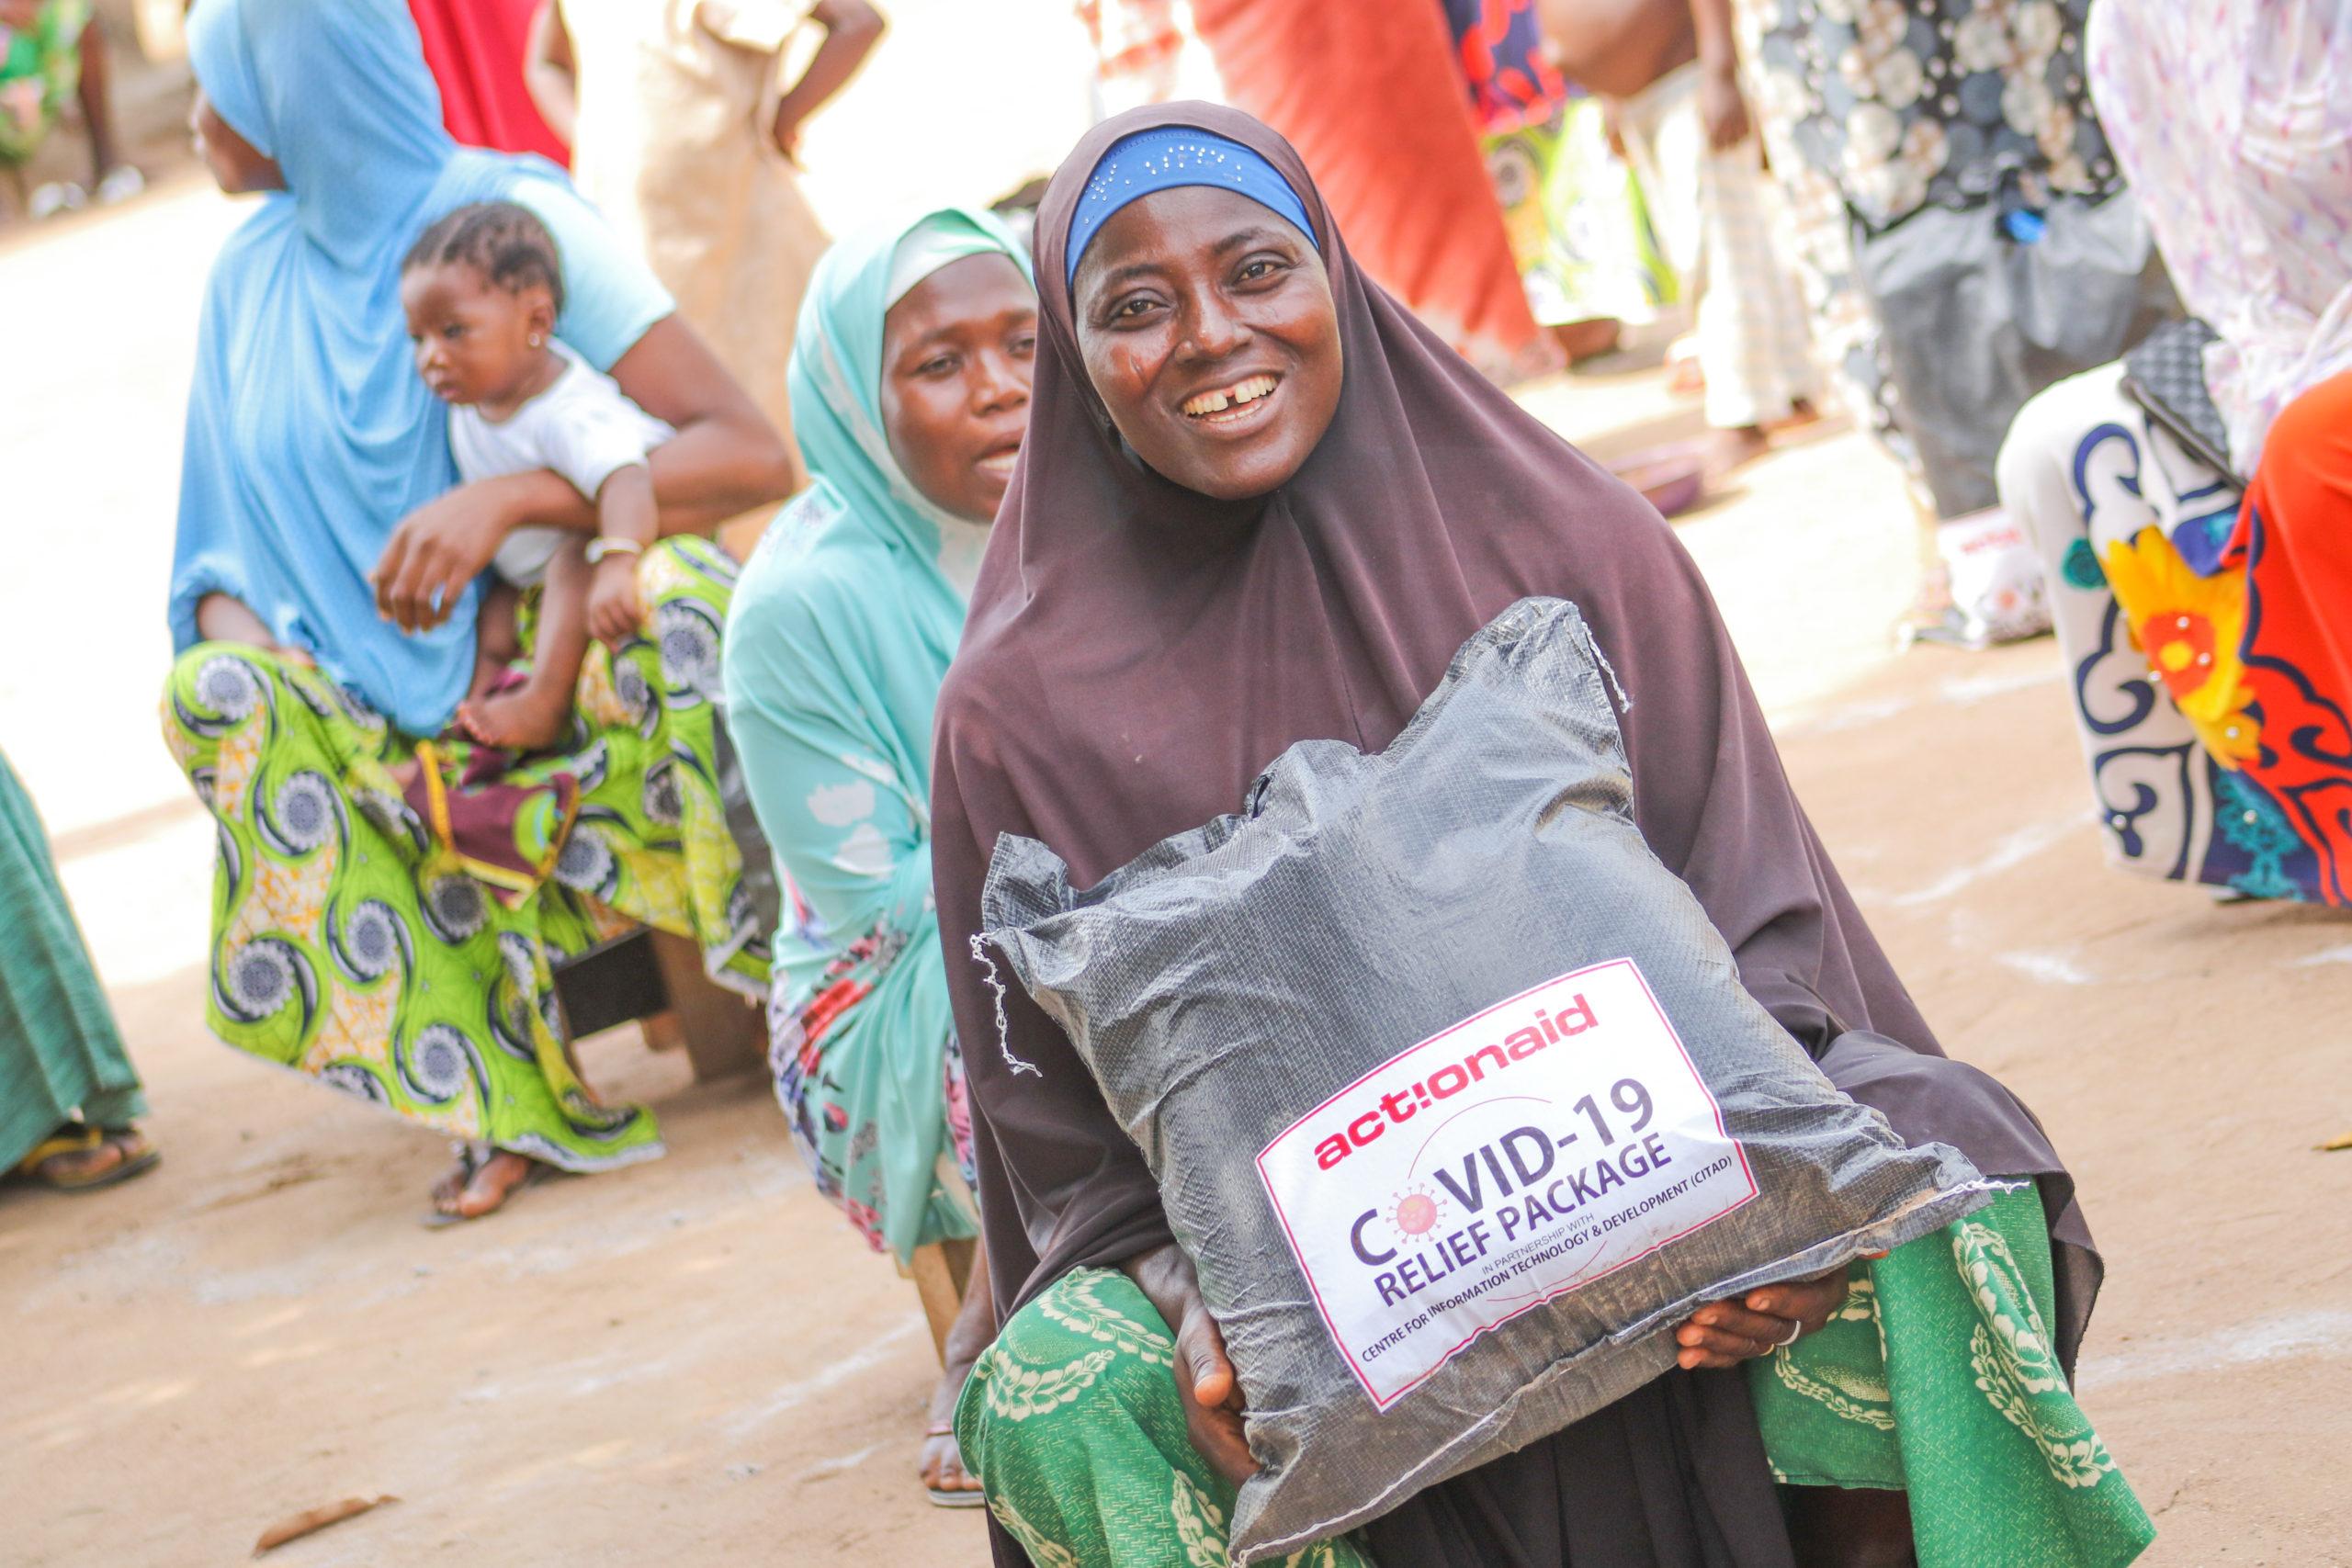 Giornata Mondiale dell'Aiuto Umanitario 2020 - ActionAid